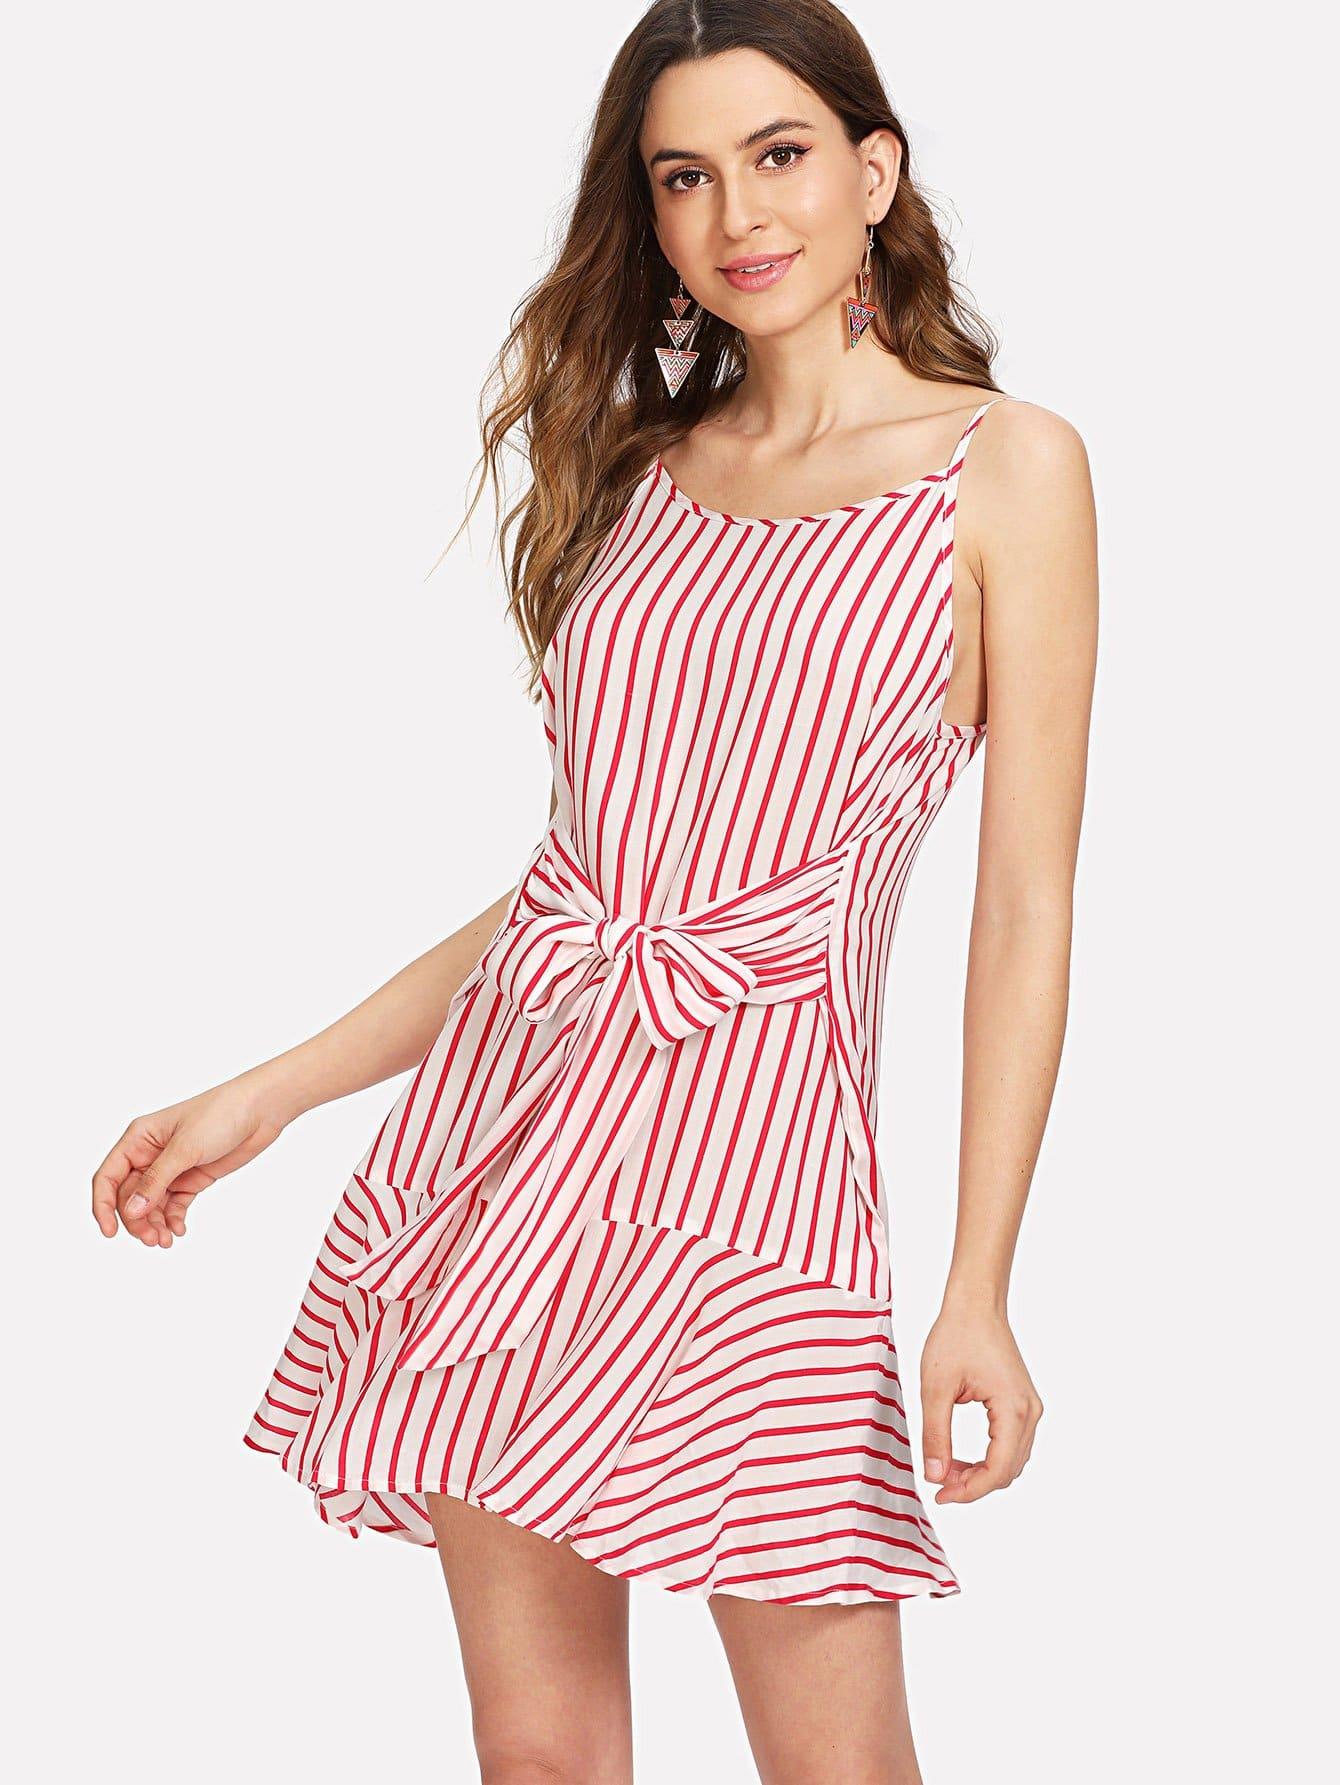 Фото - Bow Tie Front Ruffle Hem Striped Dress tie front ruffle hem striped romper